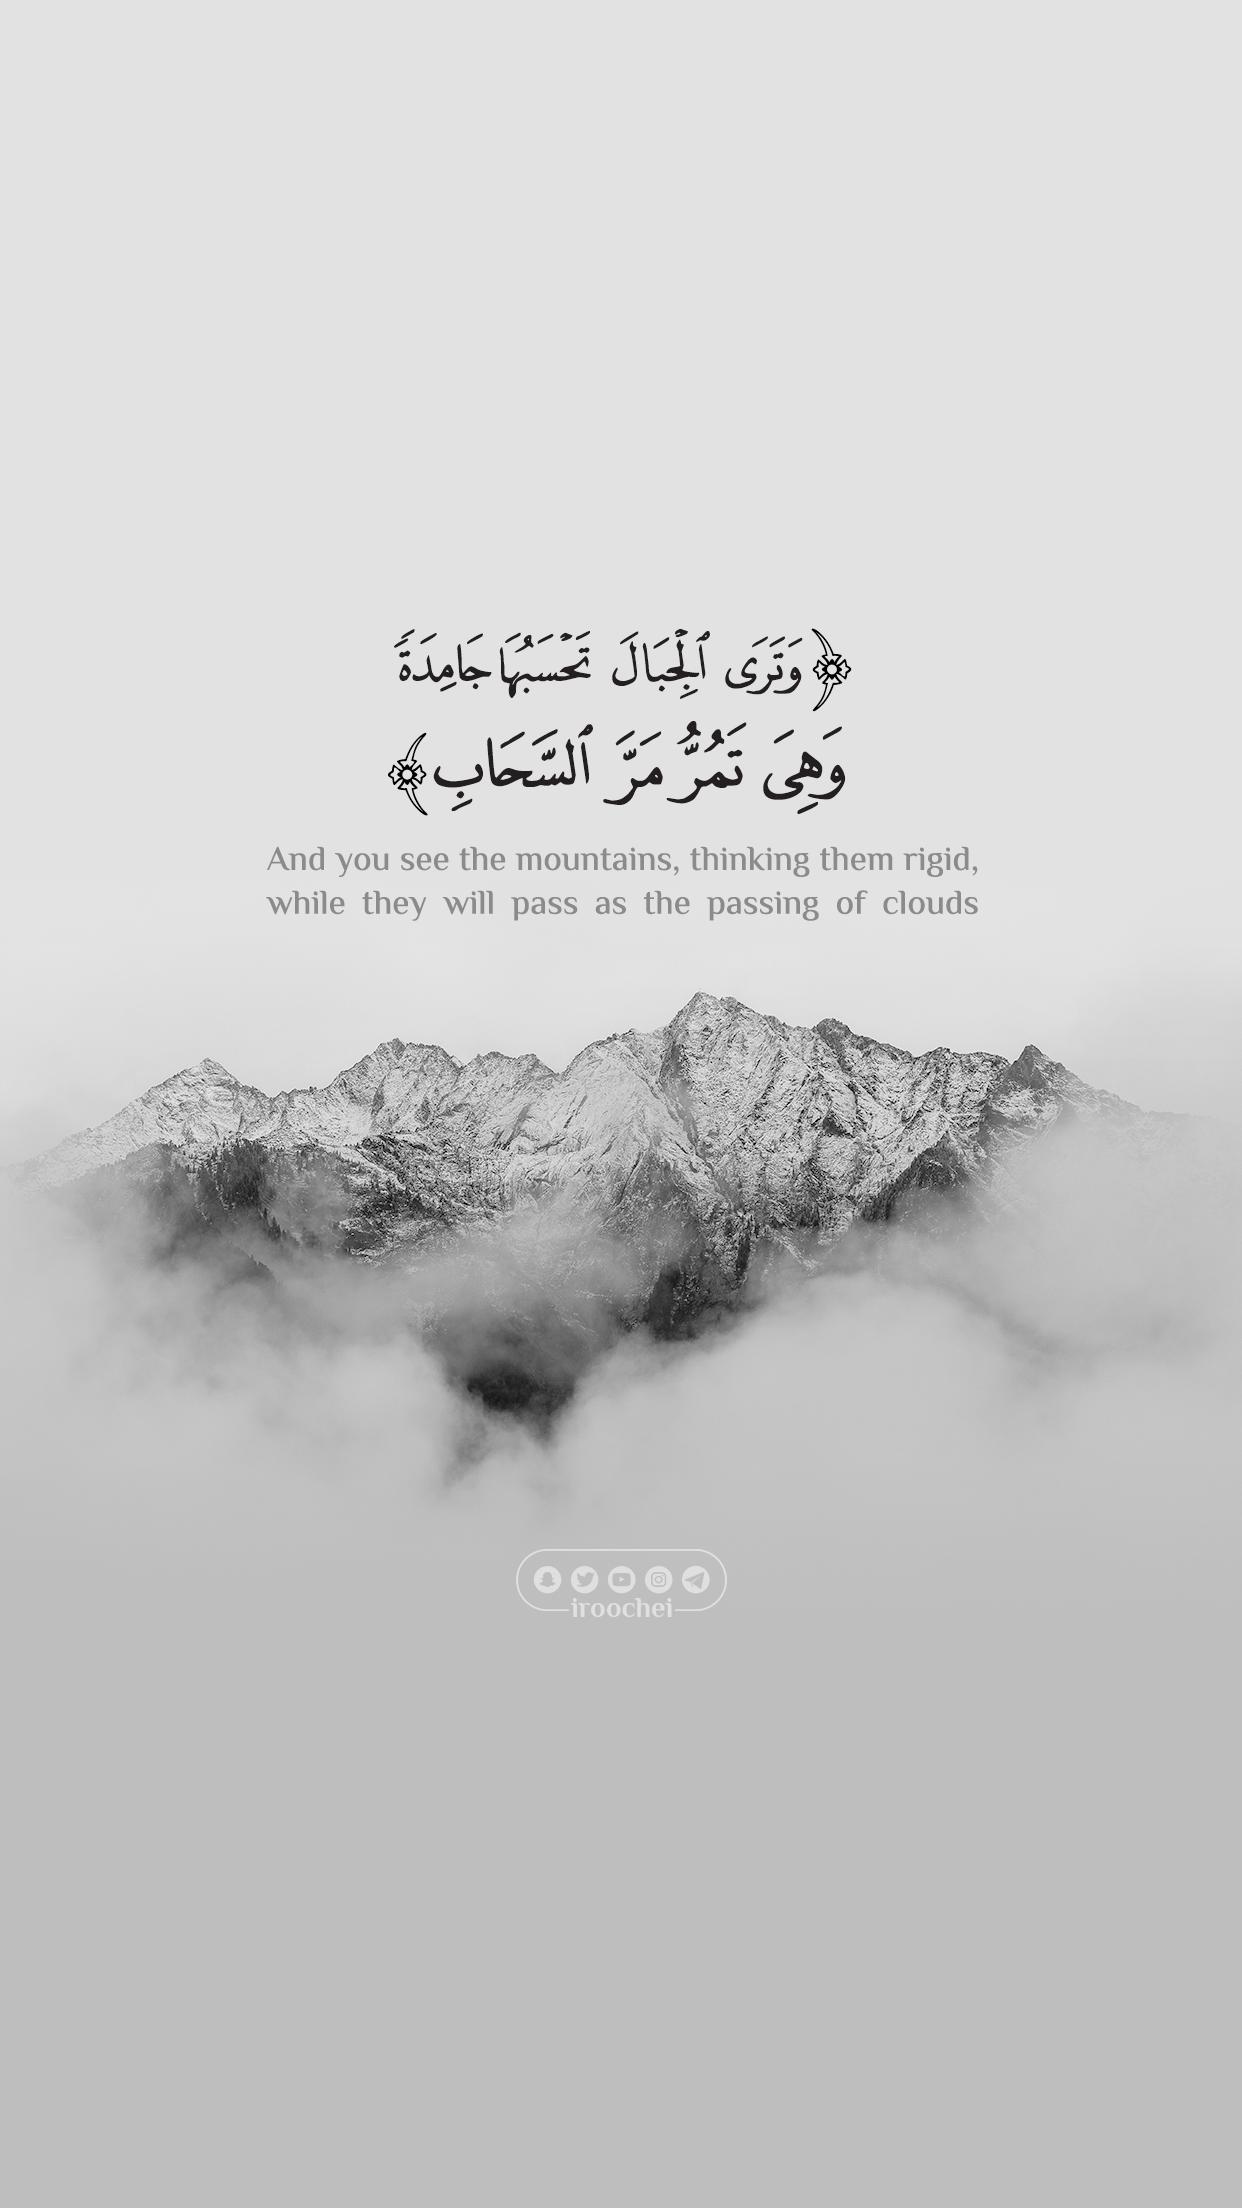 وترى الجبال تحسبها جامدة Beautiful Quran Quotes Quran Quotes Verses Quran Quotes